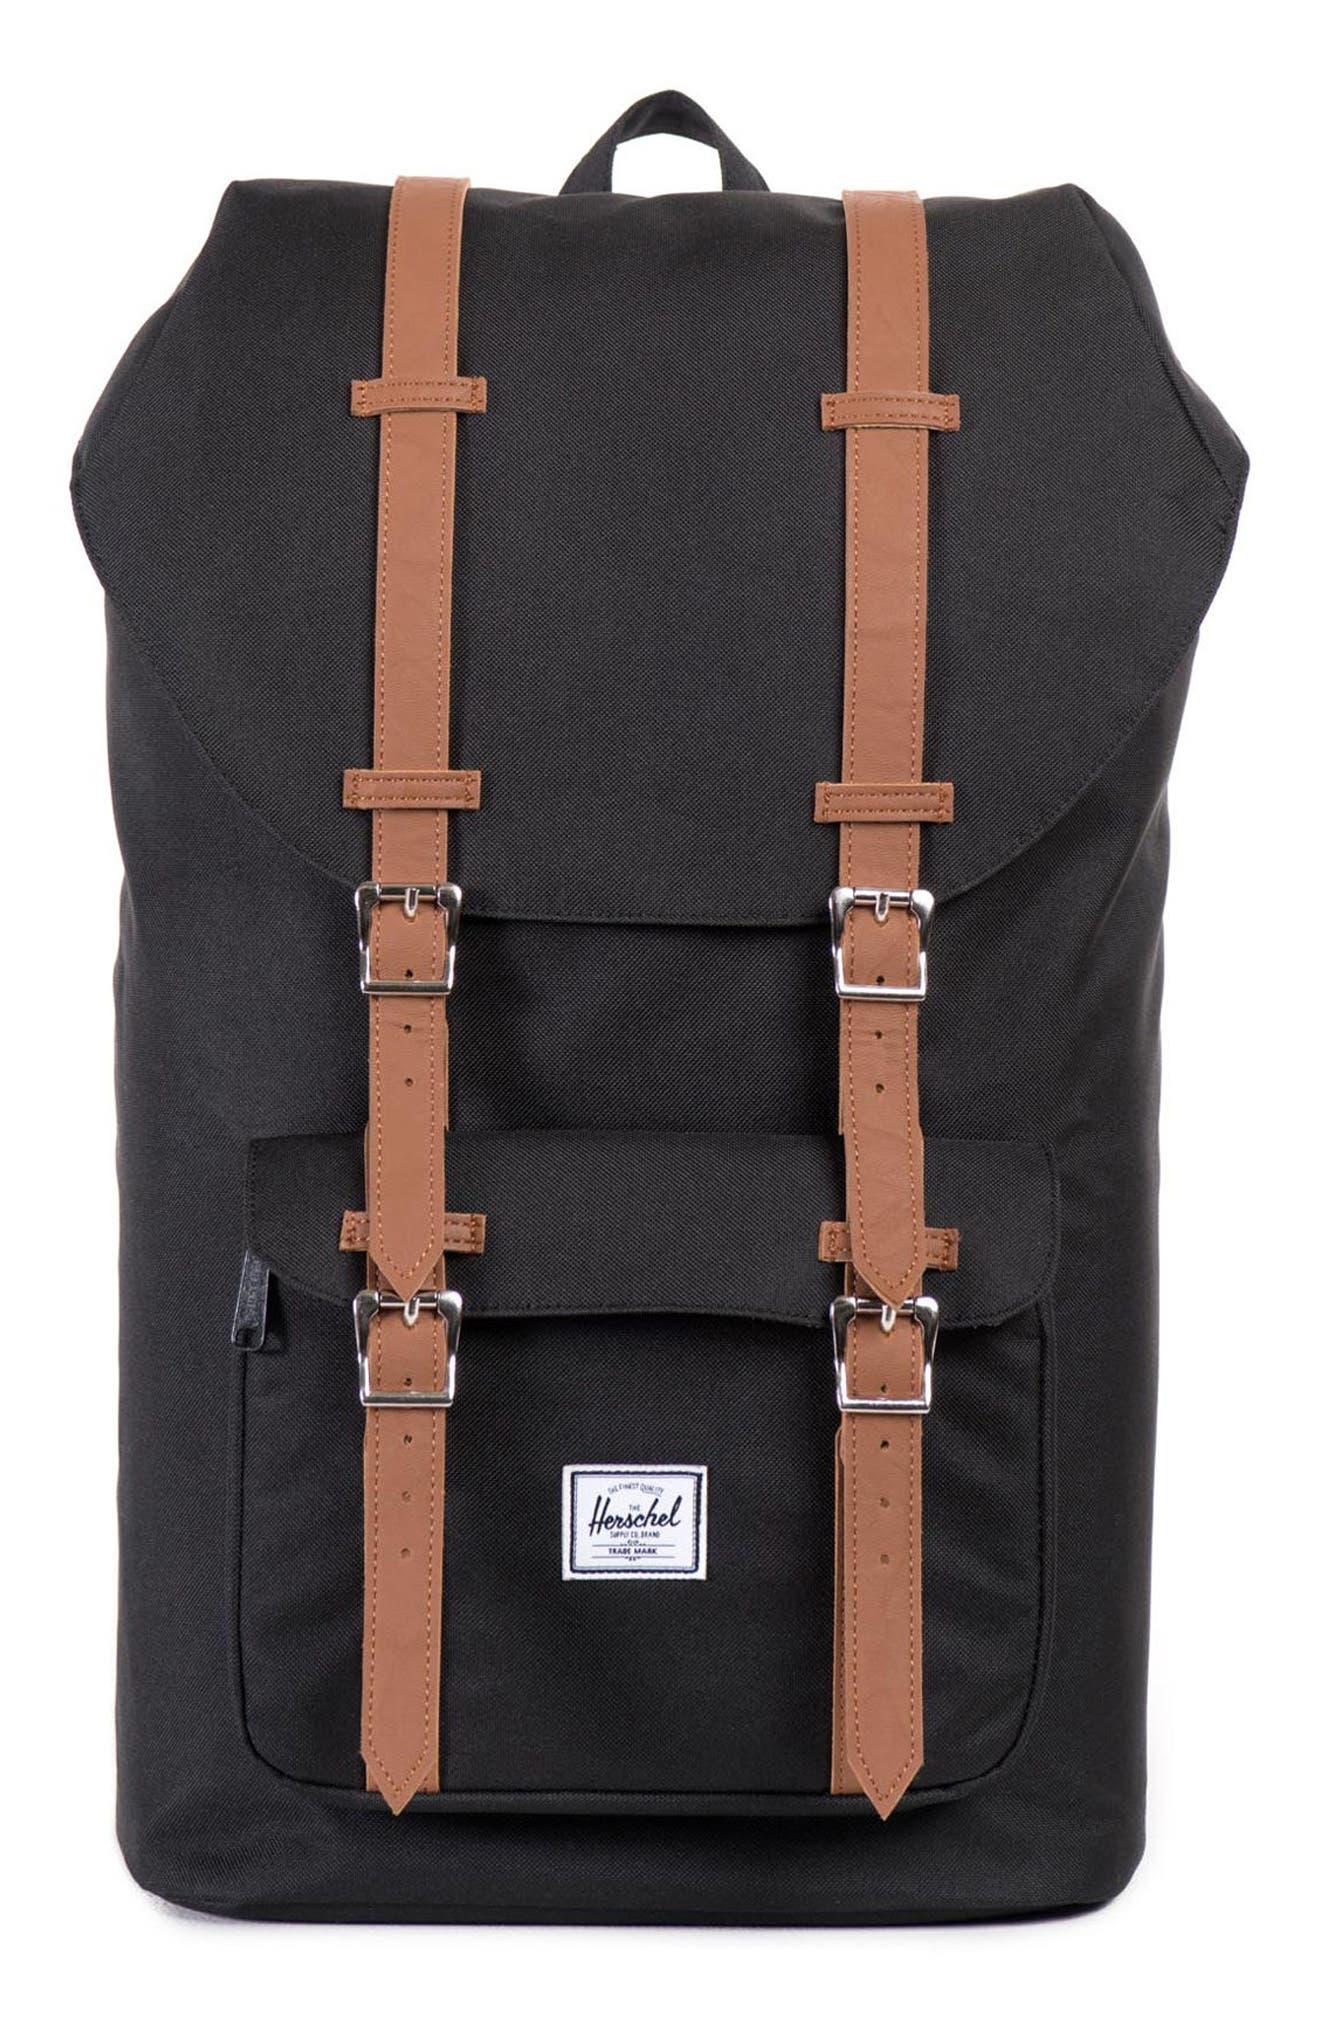 HERSCHEL SUPPLY CO. 'Little America' Backpack, Main, color, BLACK